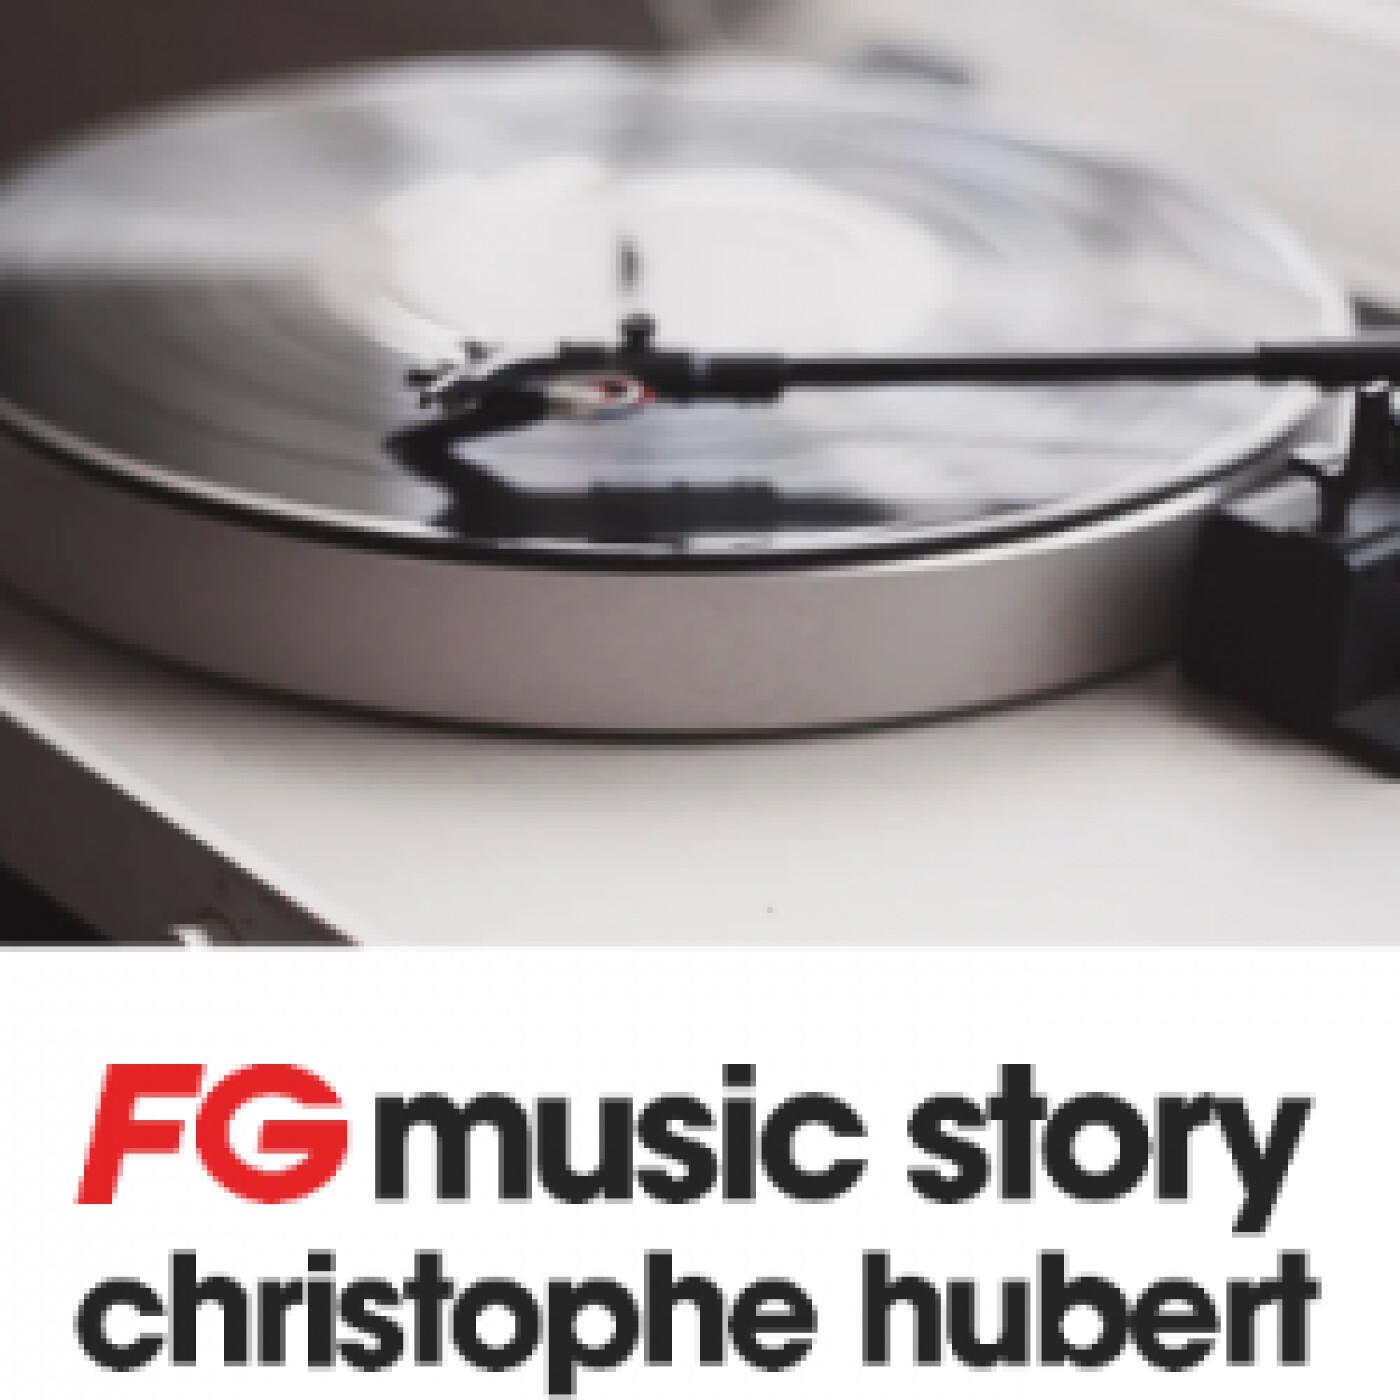 FG MUSIC STORY : BOSTON BUN